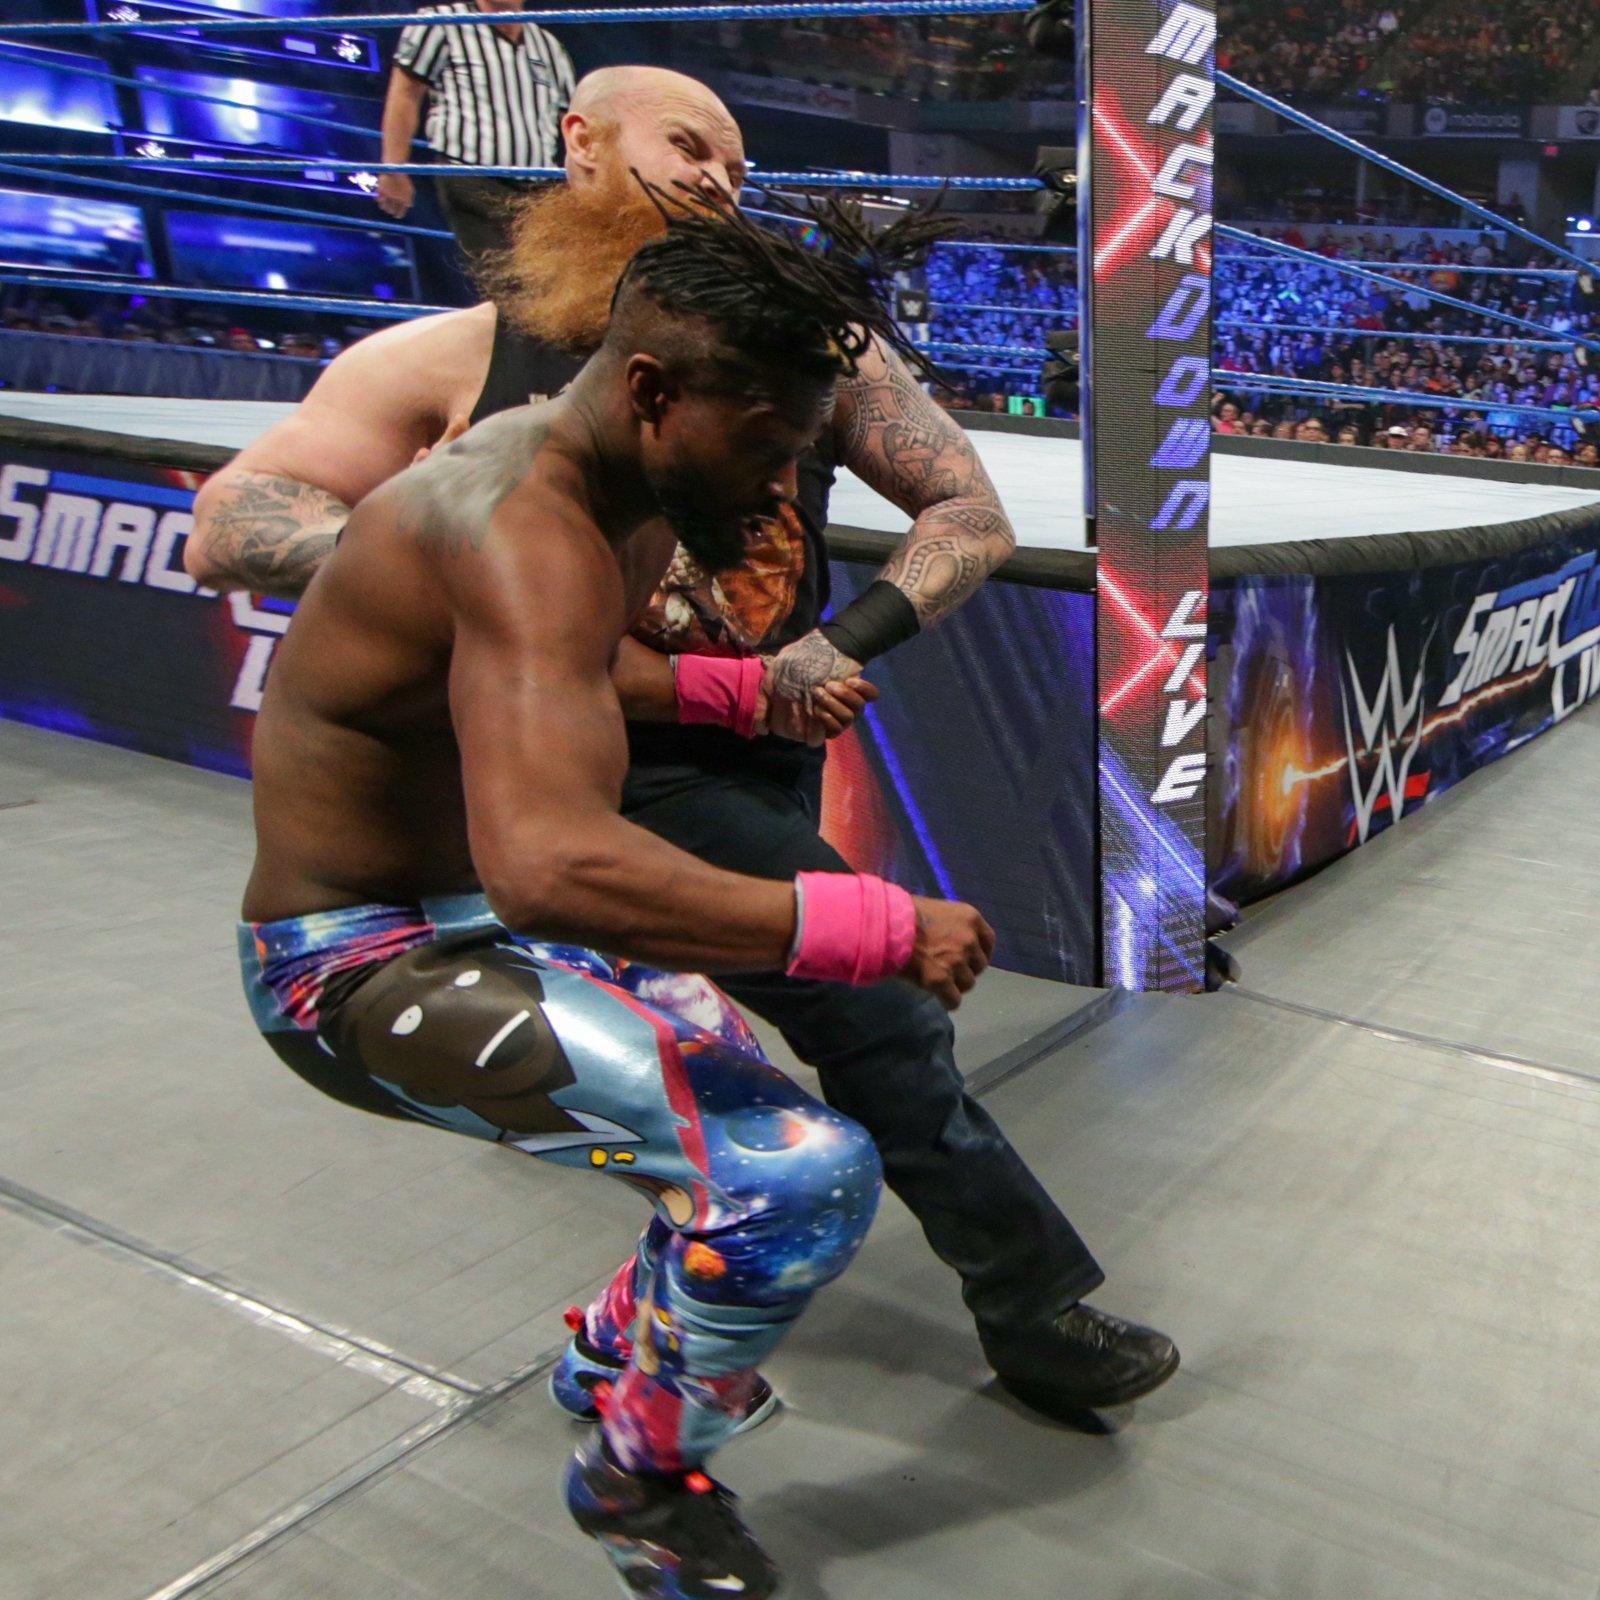 Rowan gets disqualified for striking Kofi with a steel chair...